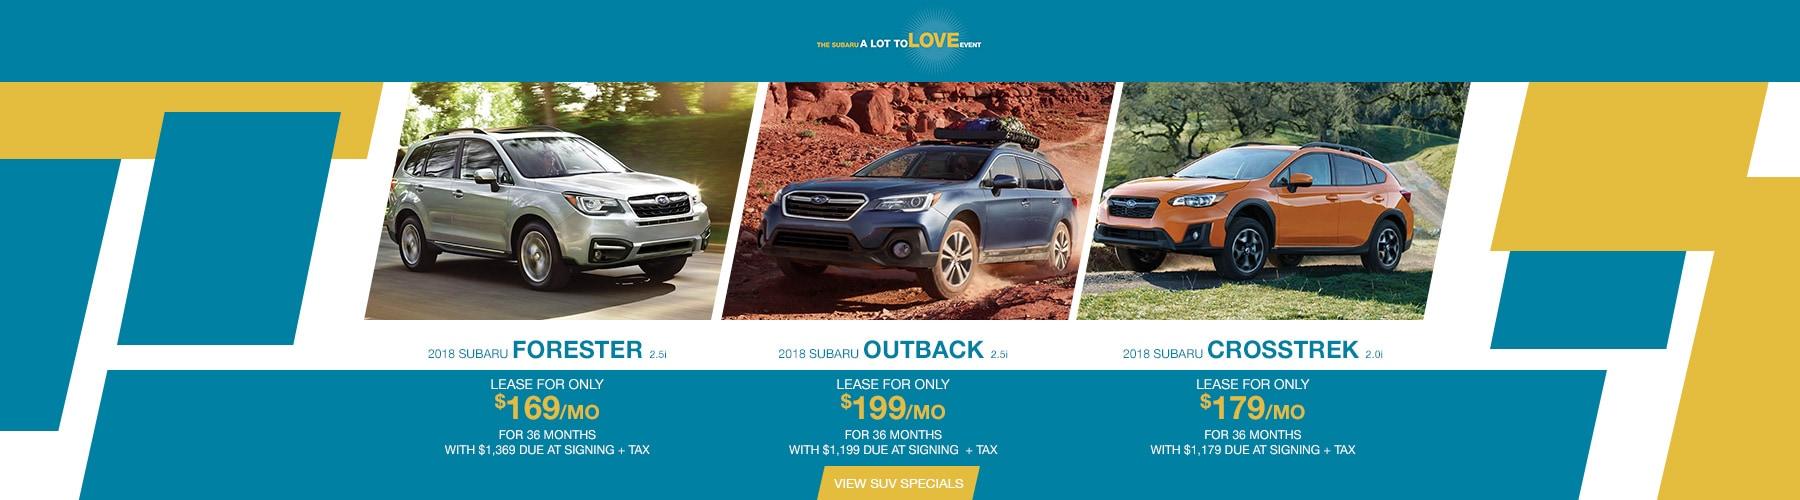 New & Used Subaru Sales in Colorado Springs CO   Heuberger Subaru